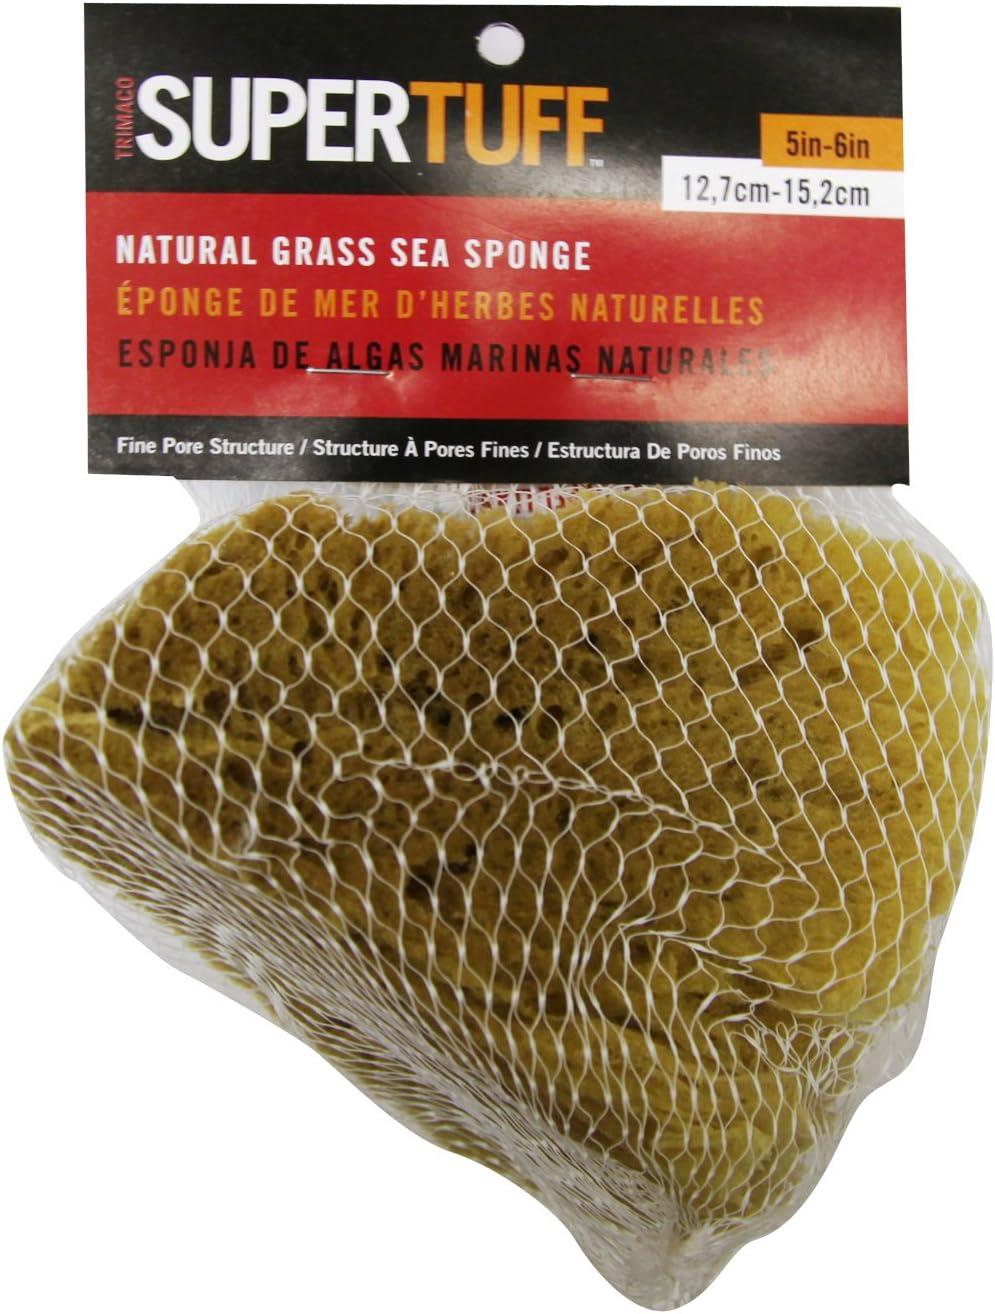 5-6-inches Trimaco SuperTuff Natural Grass Sea Sponge